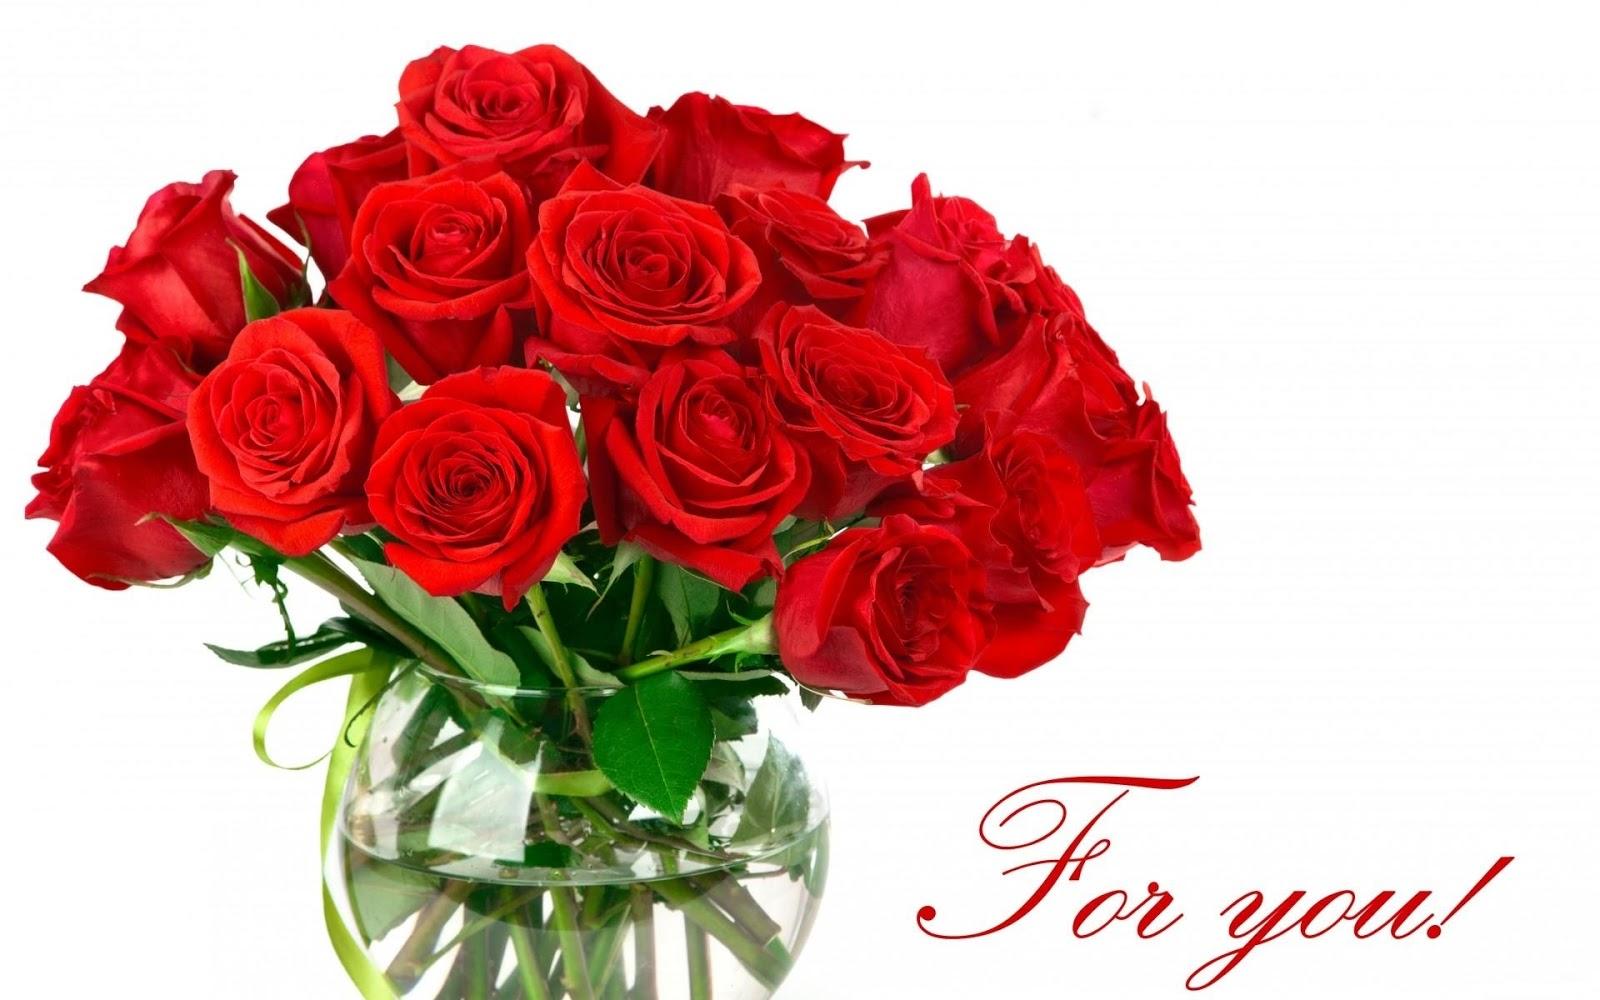 Rose flowers hd wallpapers free download - Hd flower wallpaper rose ...